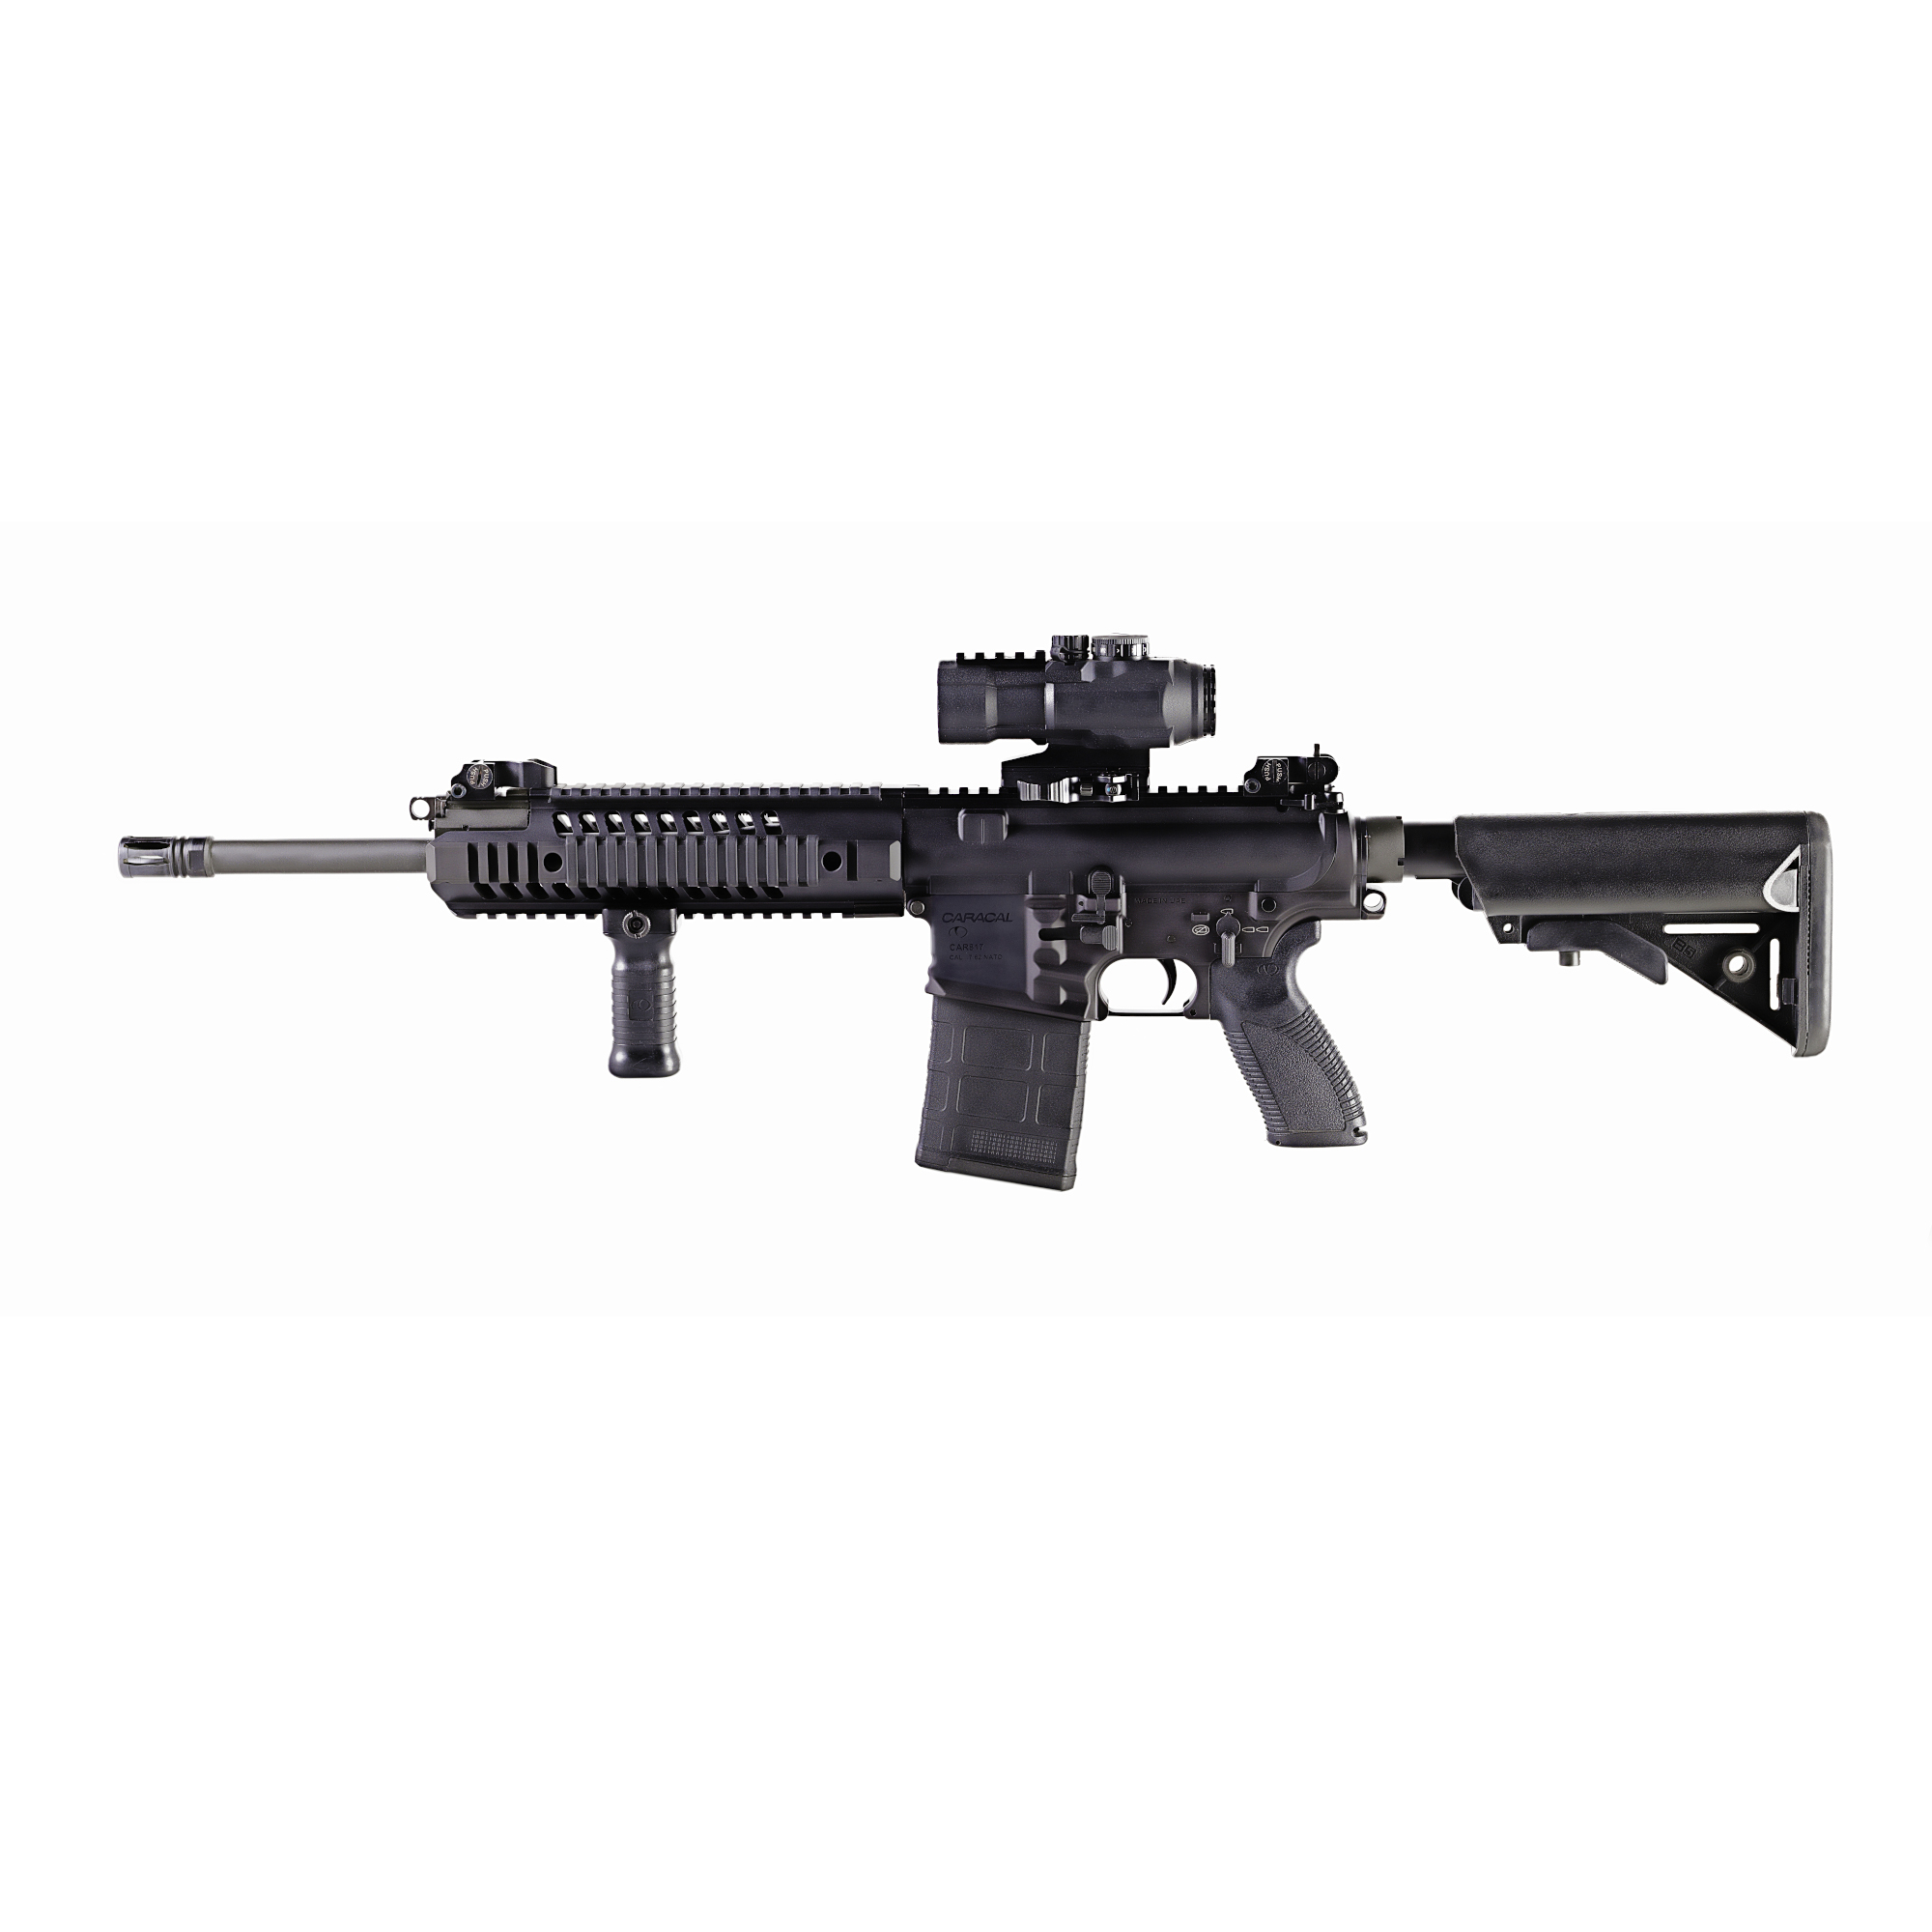 Carbine 12.5